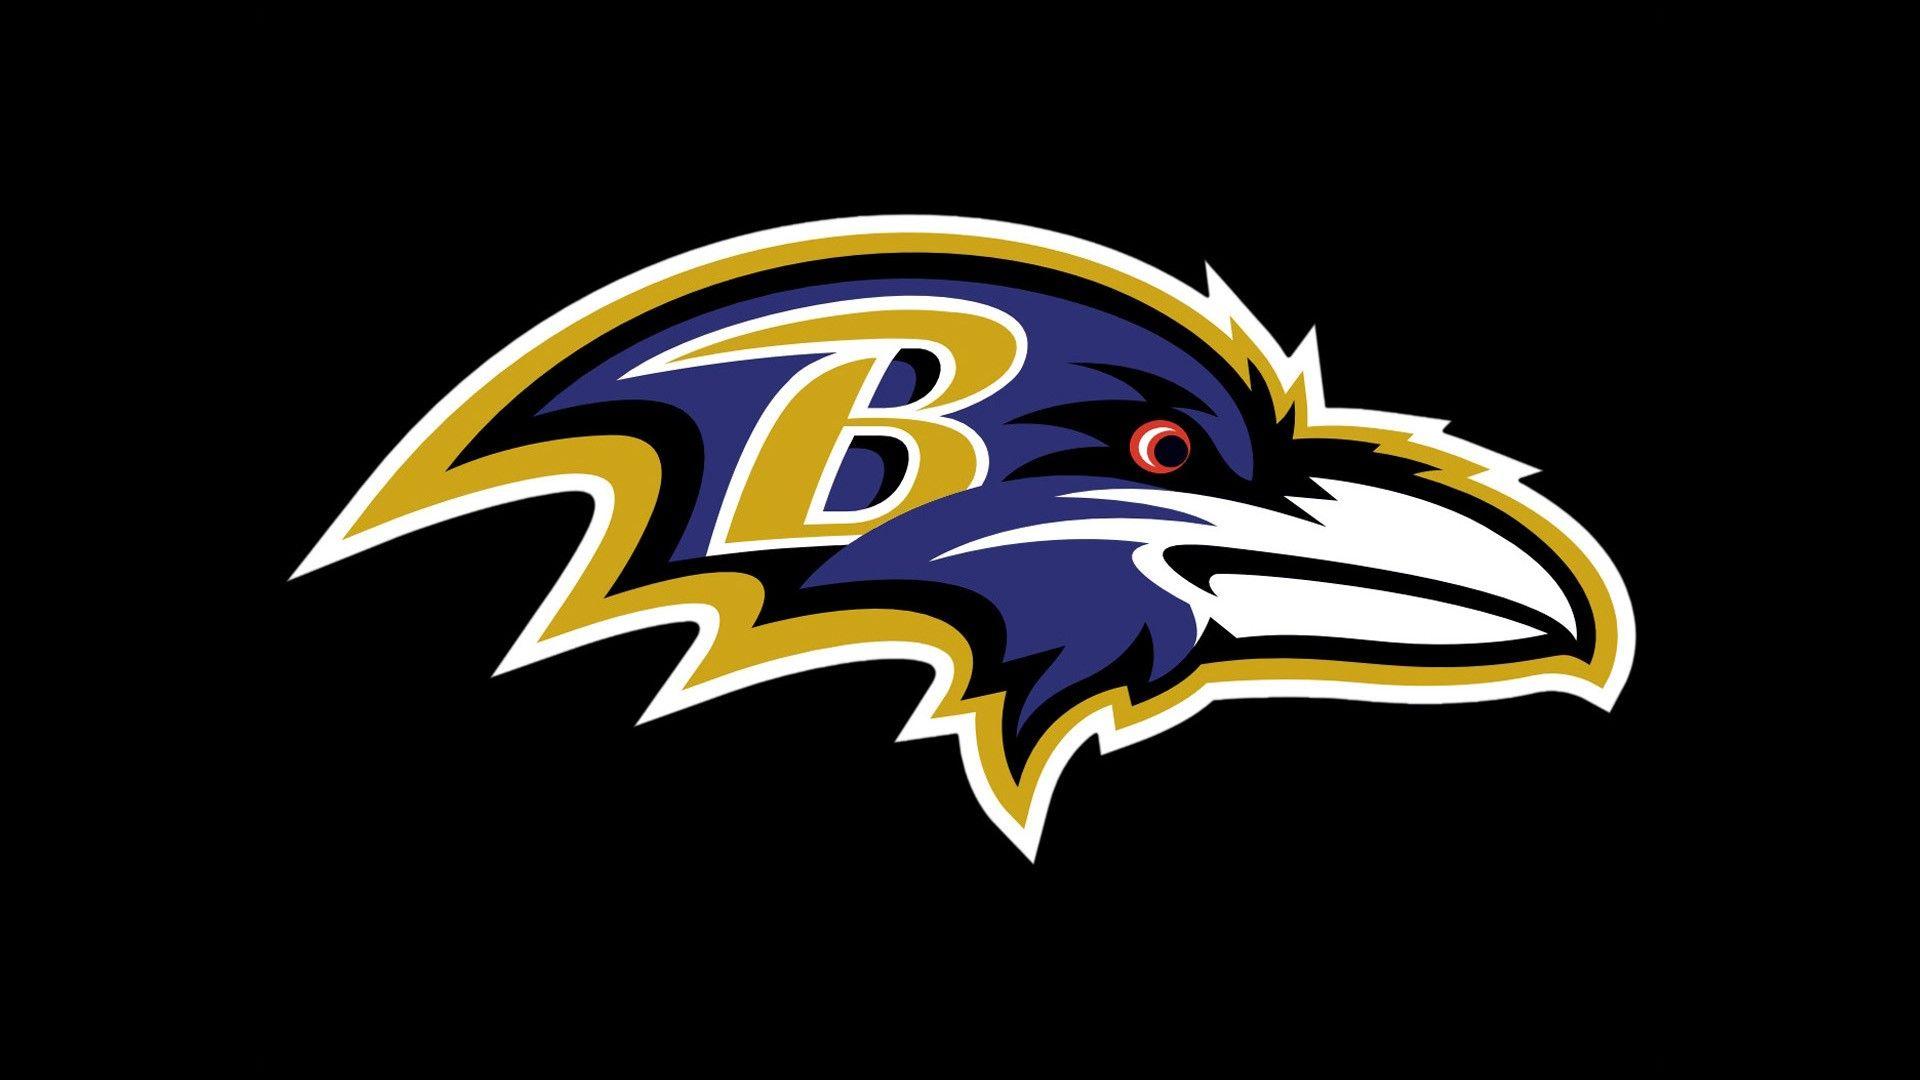 Backgrounds Ravens Hd 2021 Nfl Football Wallpapers Baltimore Ravens Logo Nfl Teams Logos Nfl Football Wallpaper